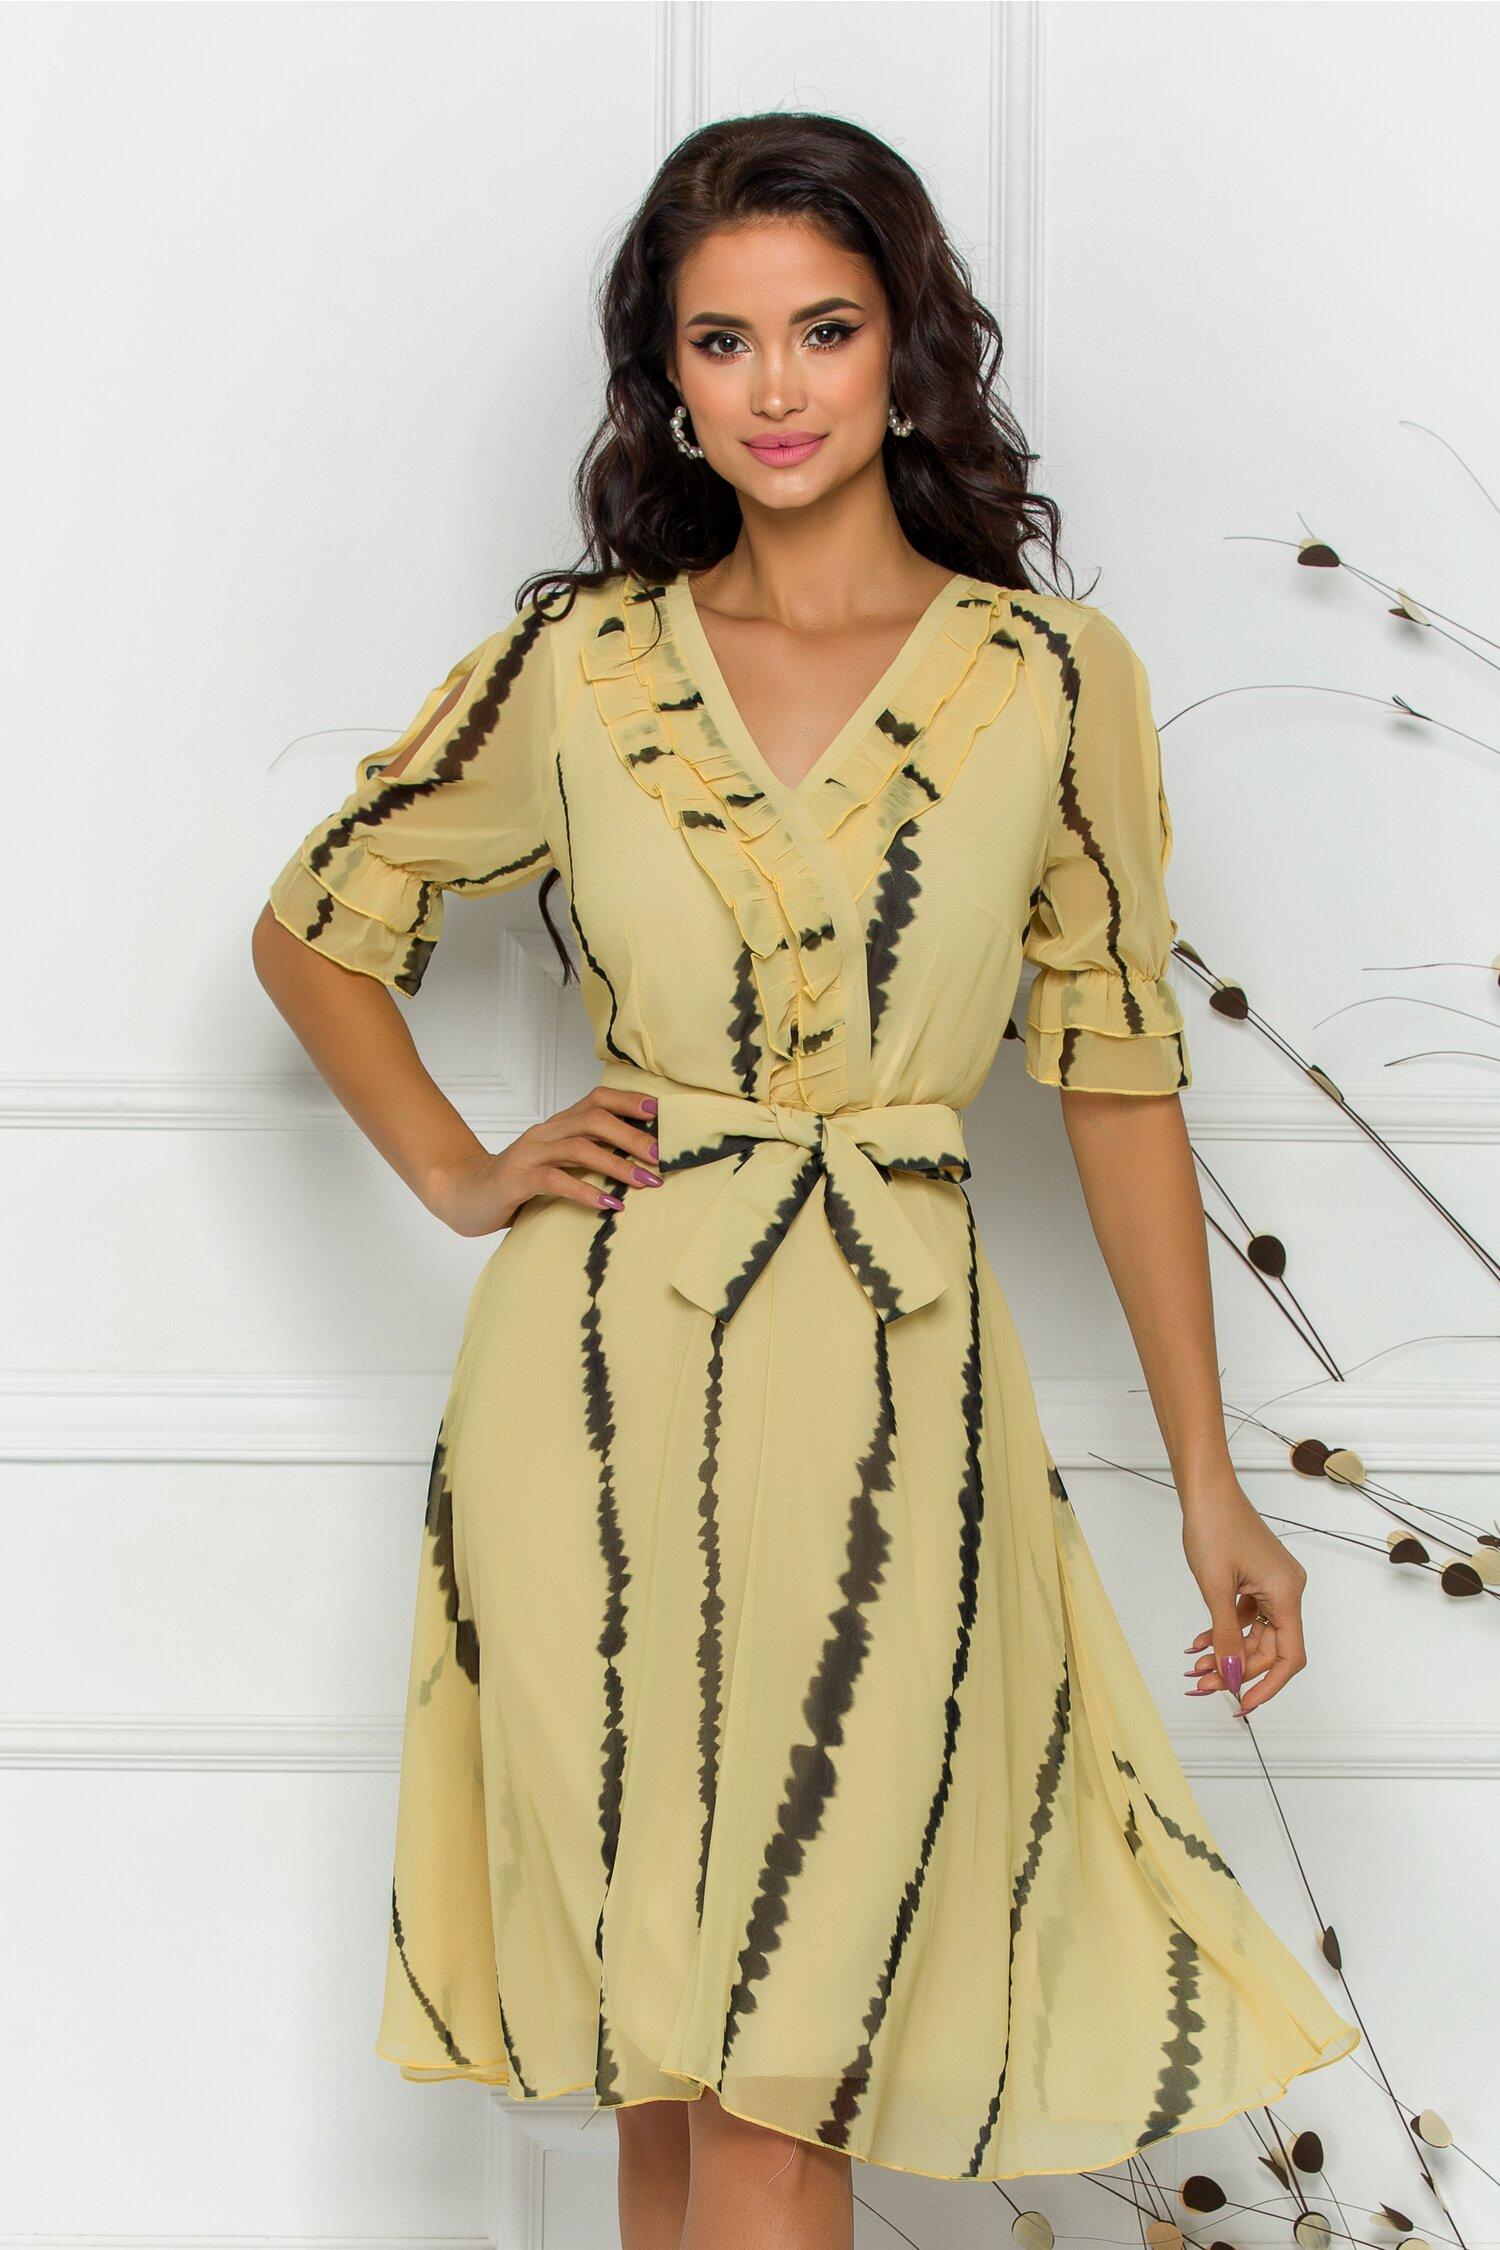 rochie vivy galben cu imprimeuri negre 598315 4